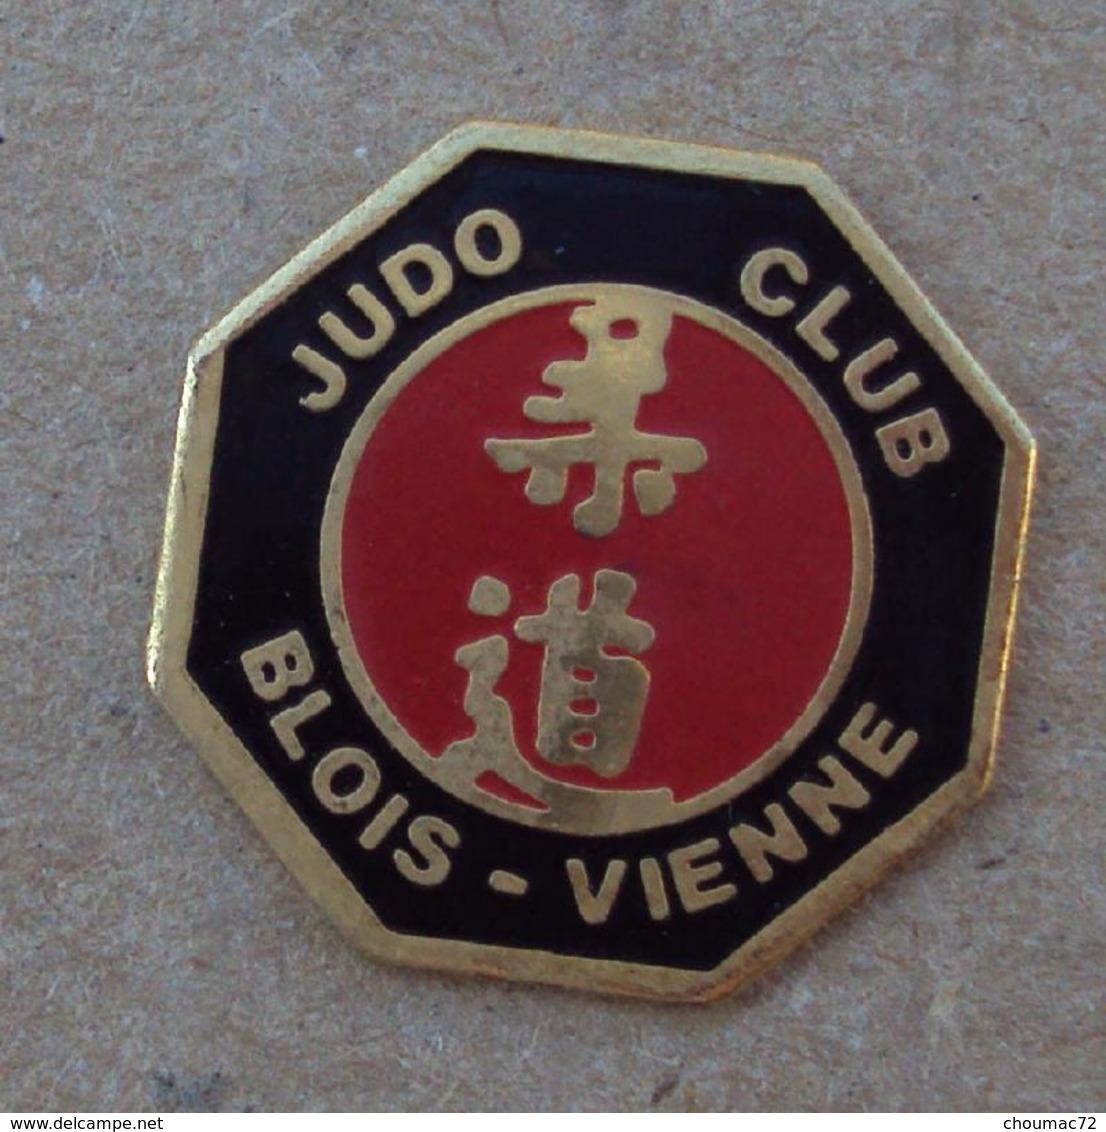 Pin's Sport Judo 001, Blois Vienne - Judo